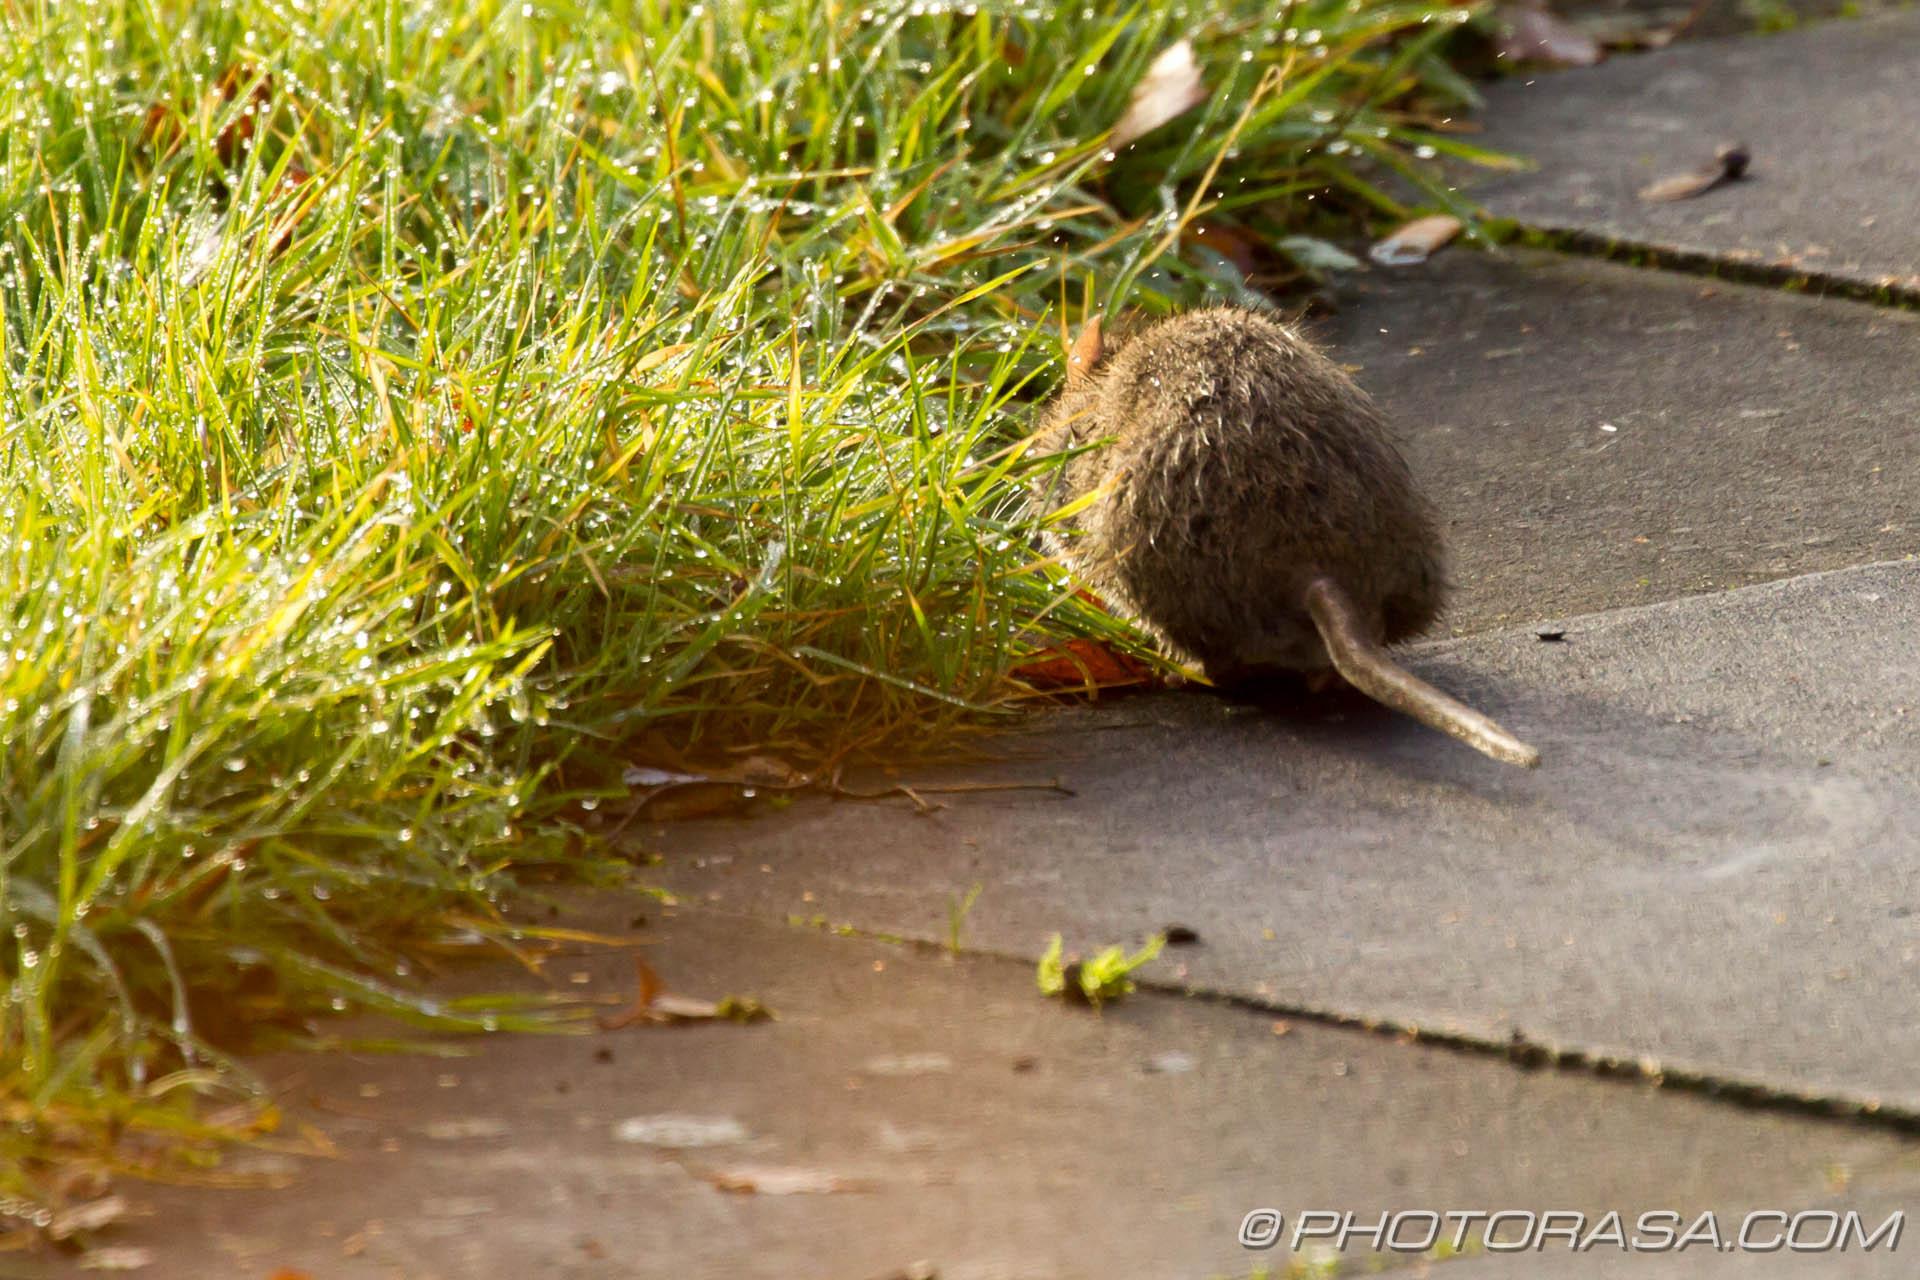 http://photorasa.com/river-rat-maidstone-market/river-rat-tail/